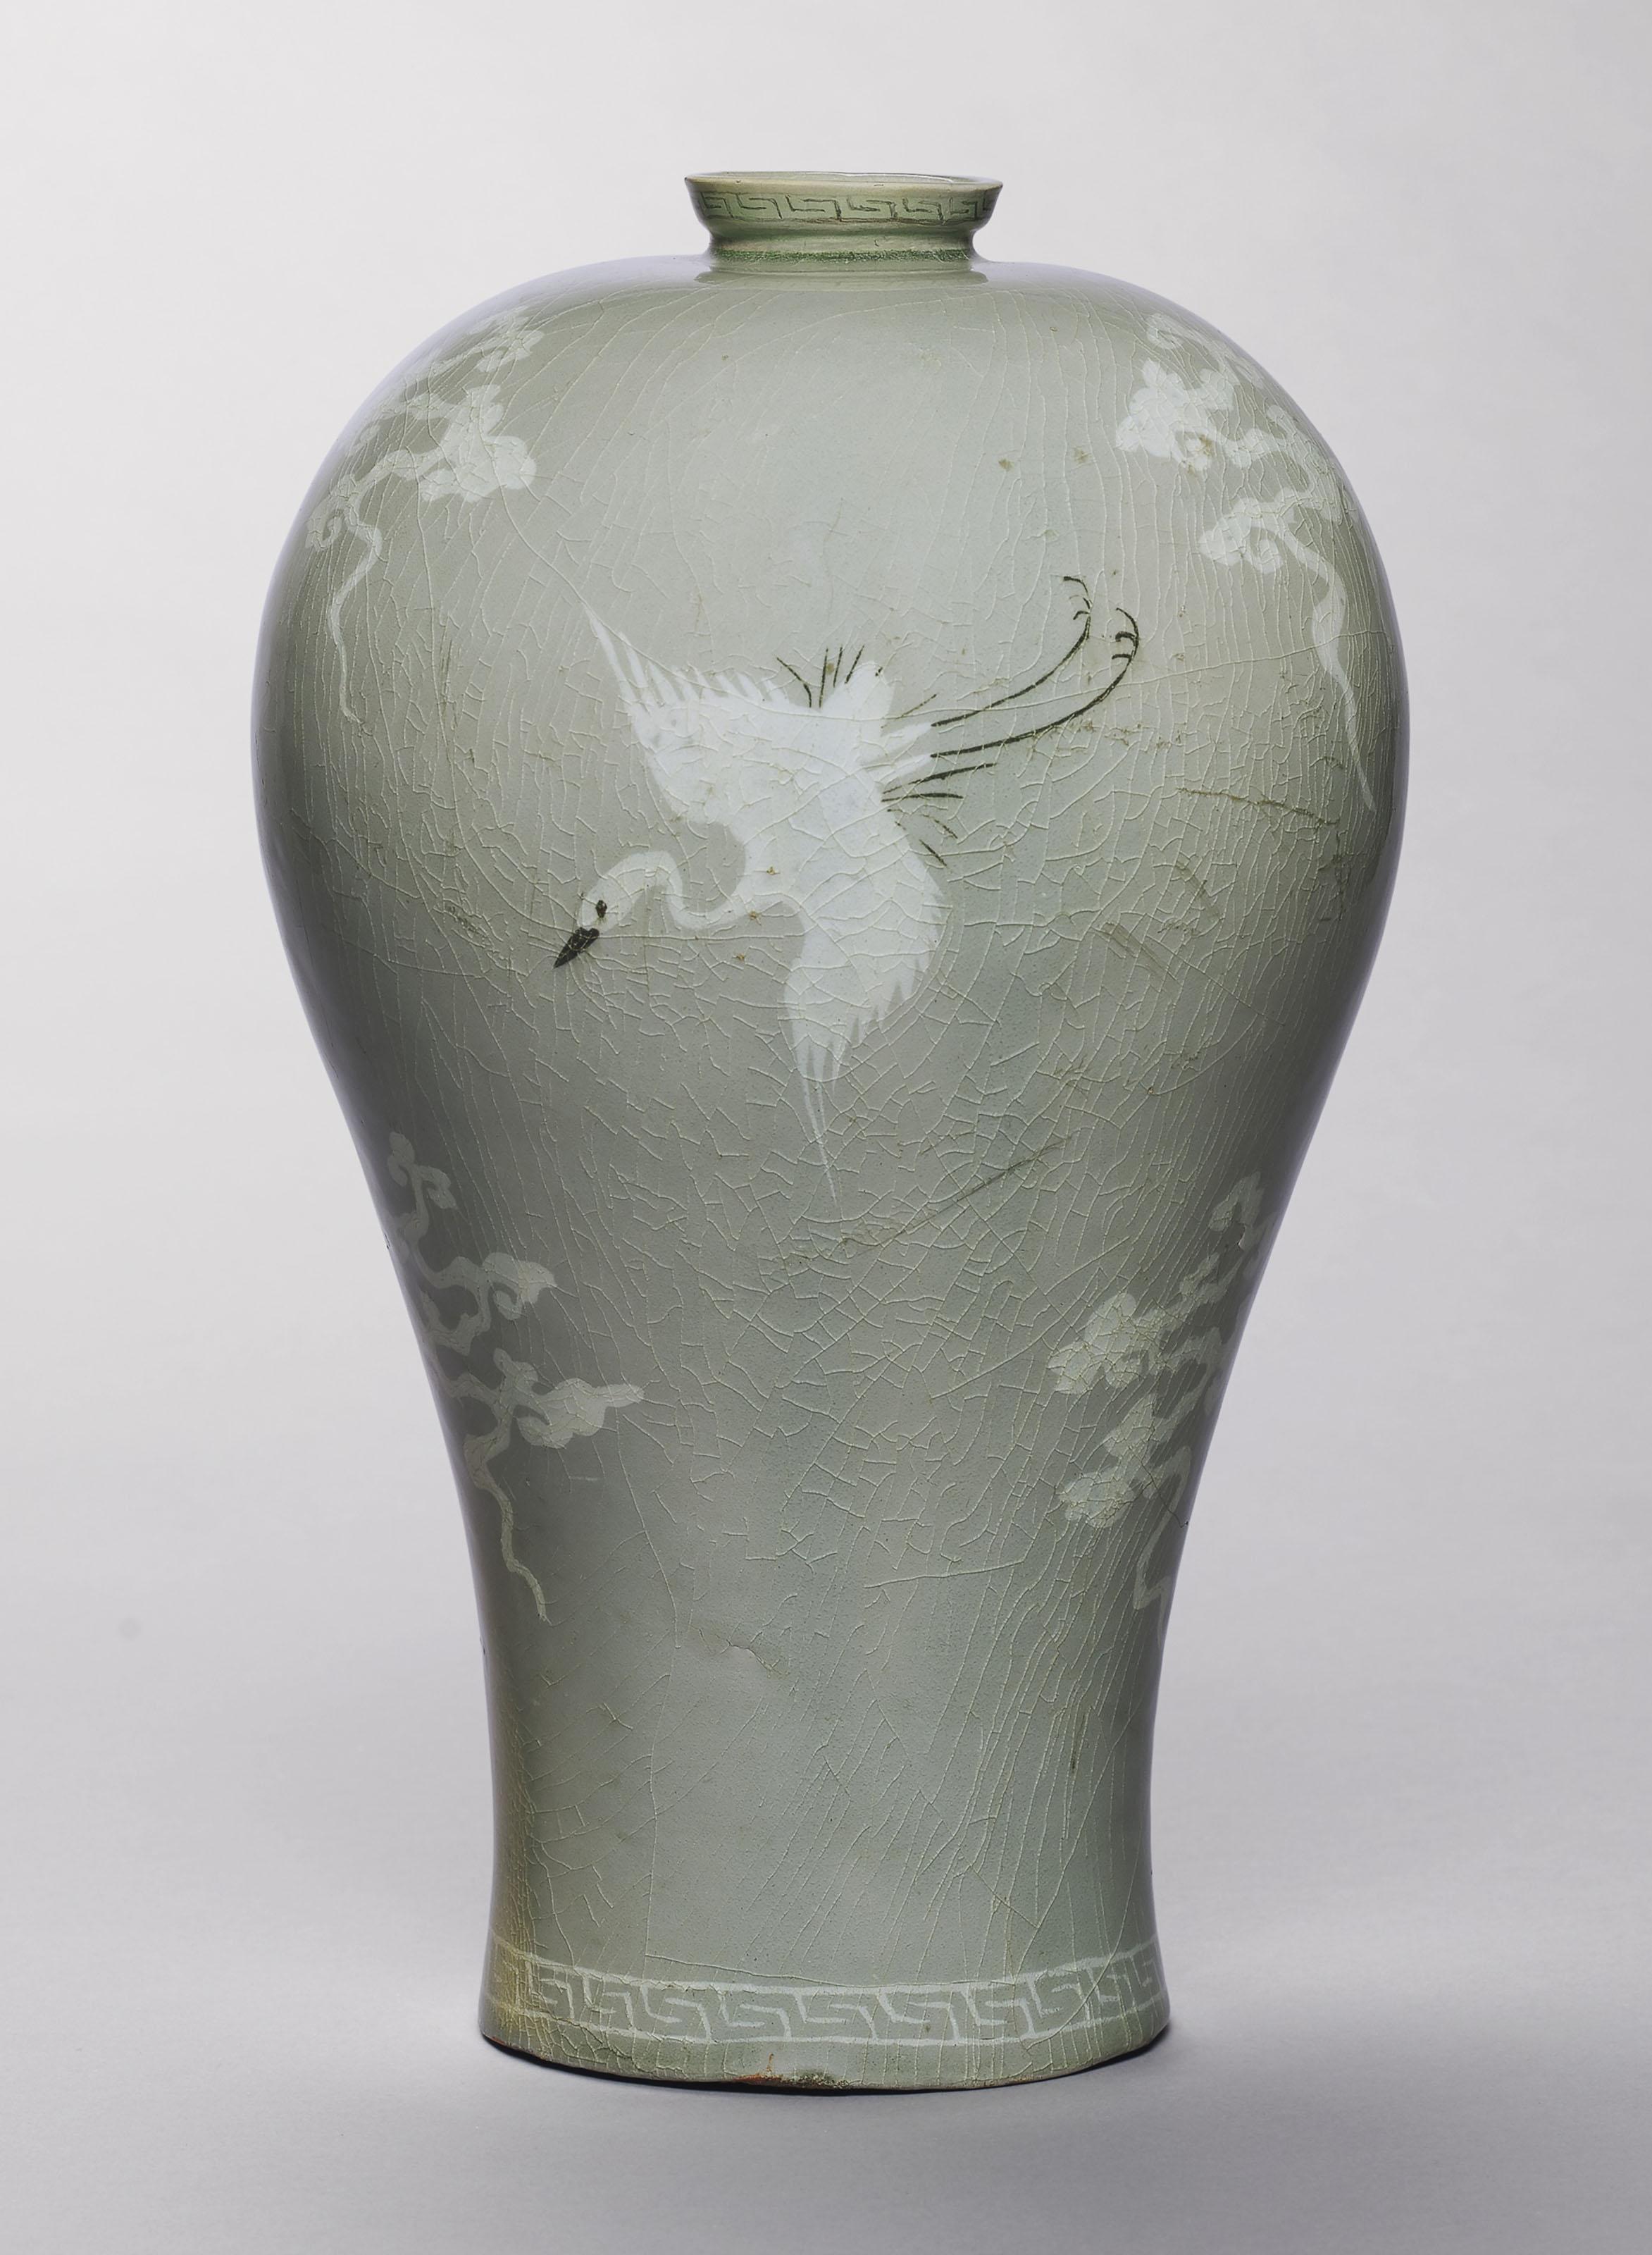 A slip-inlaid celadon stoneware maebyong